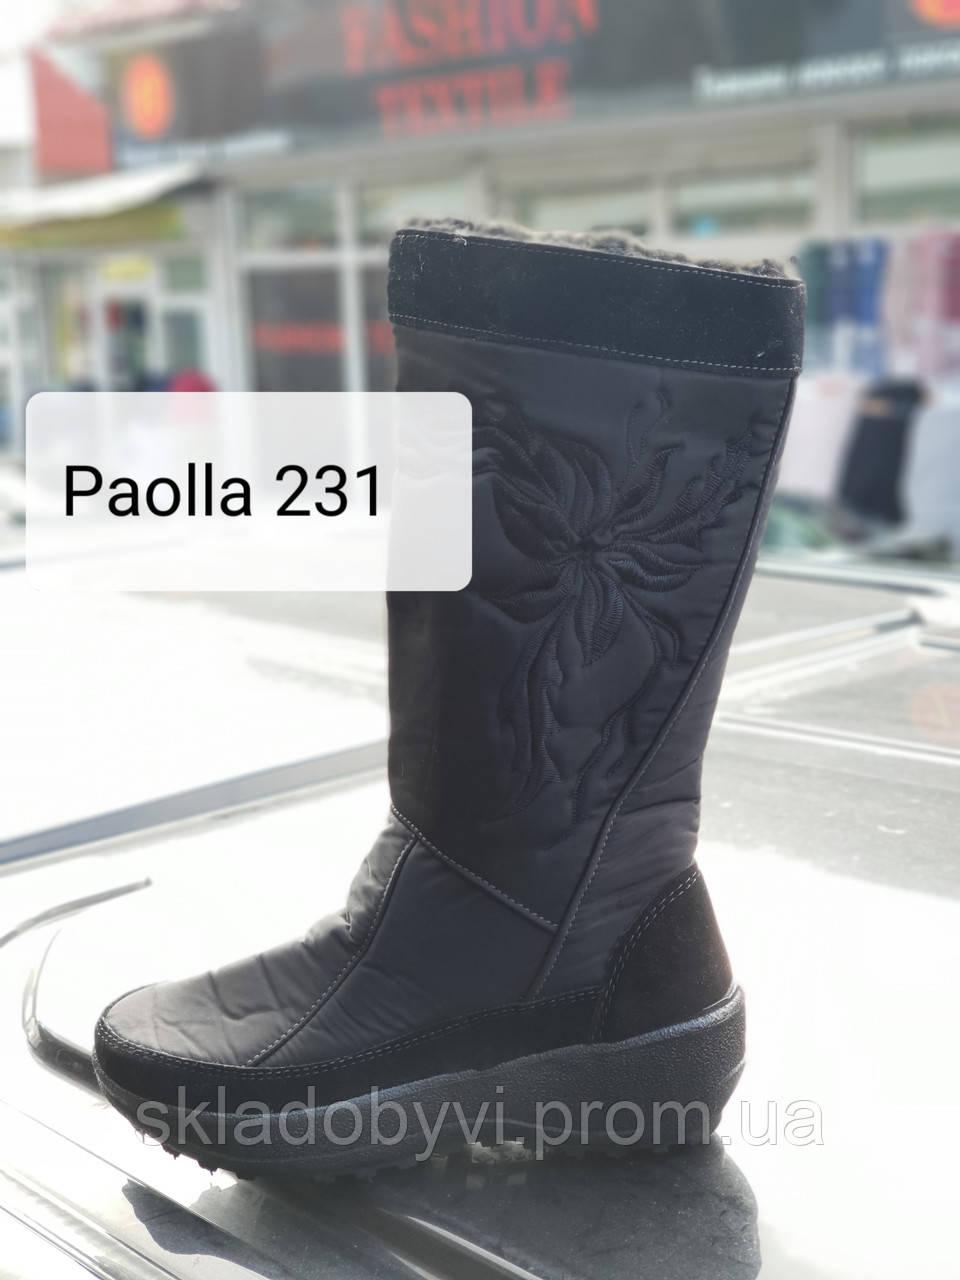 Сапоги(дутики) женские зимние Paolla 231